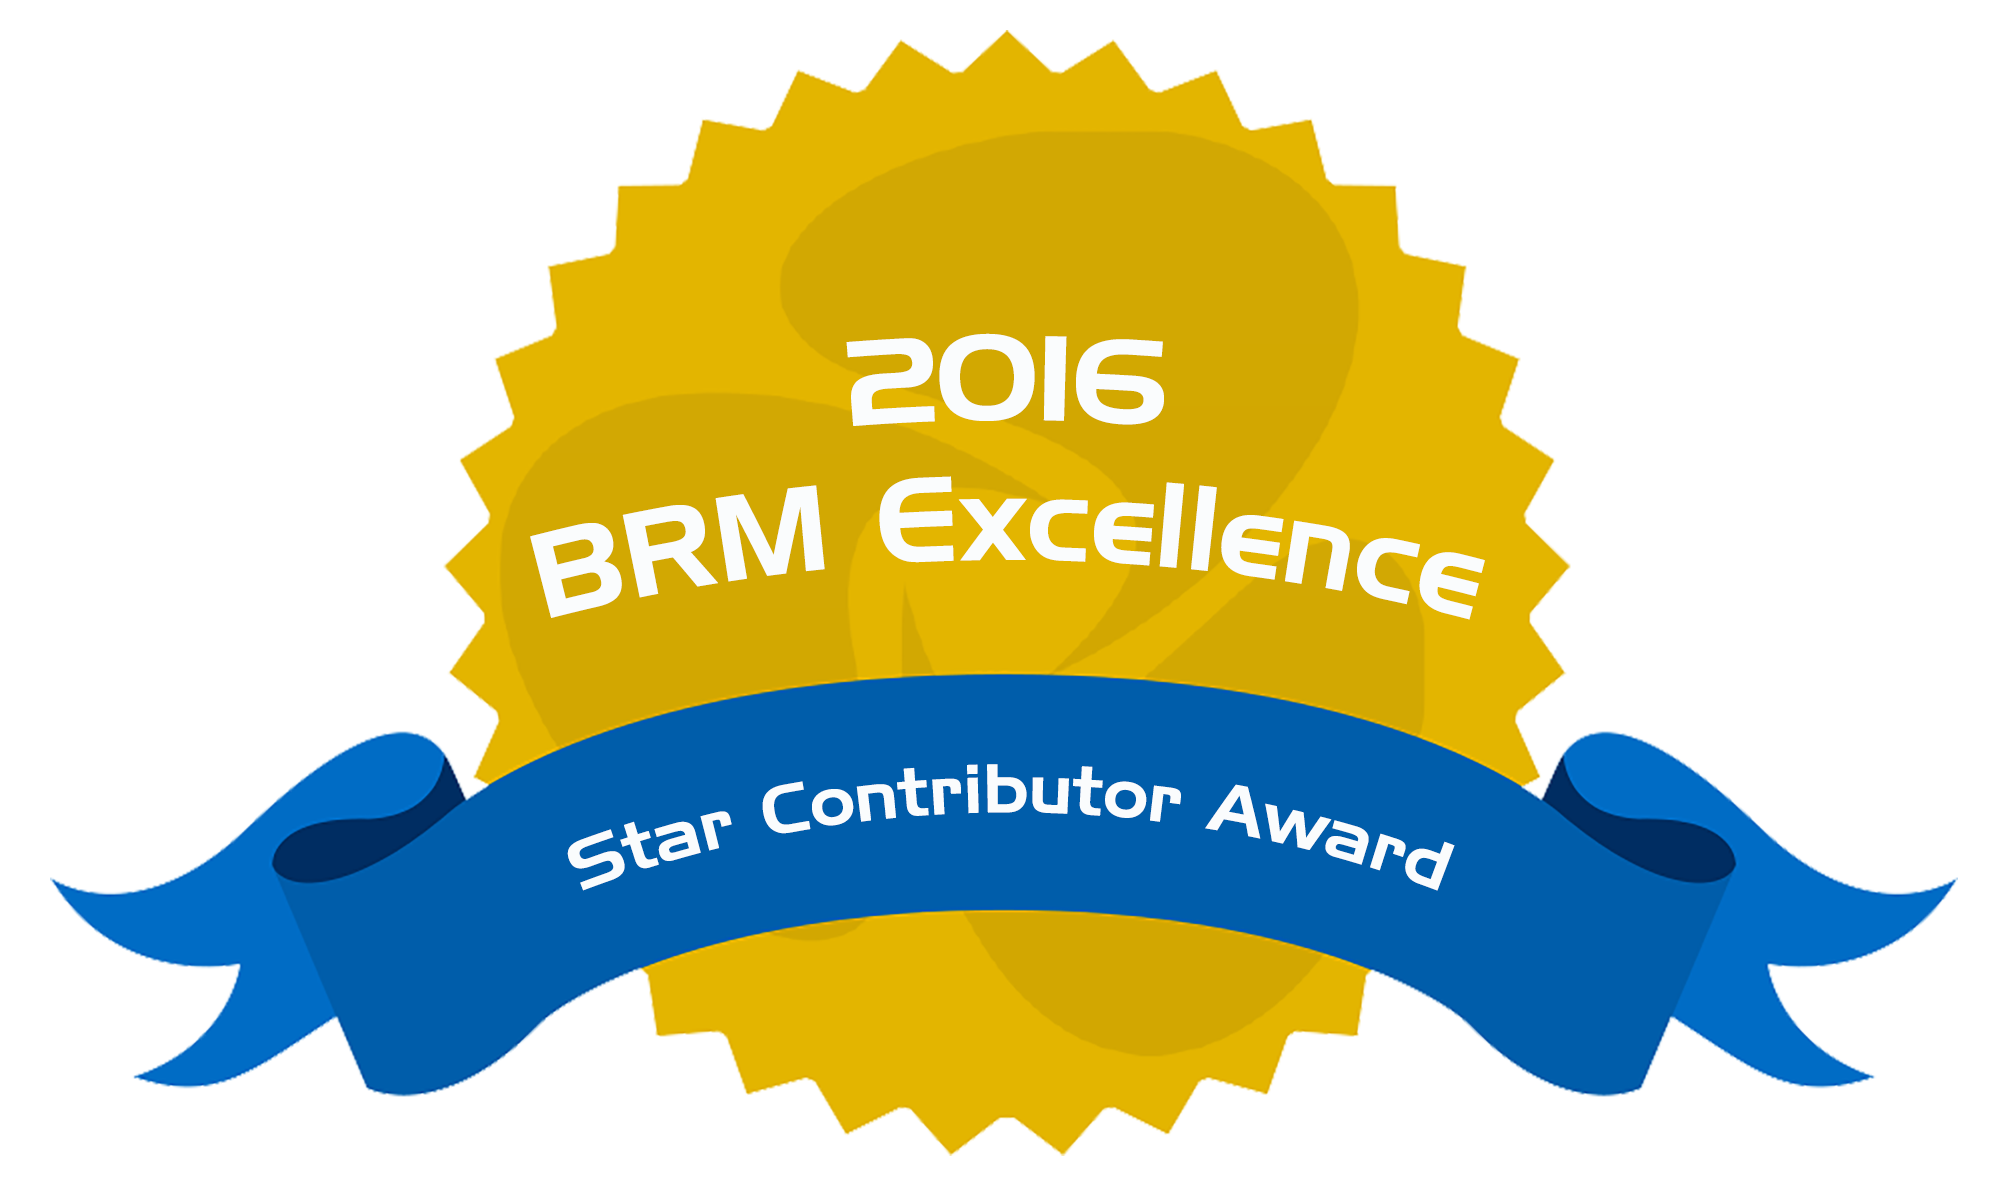 Star Contributor Award